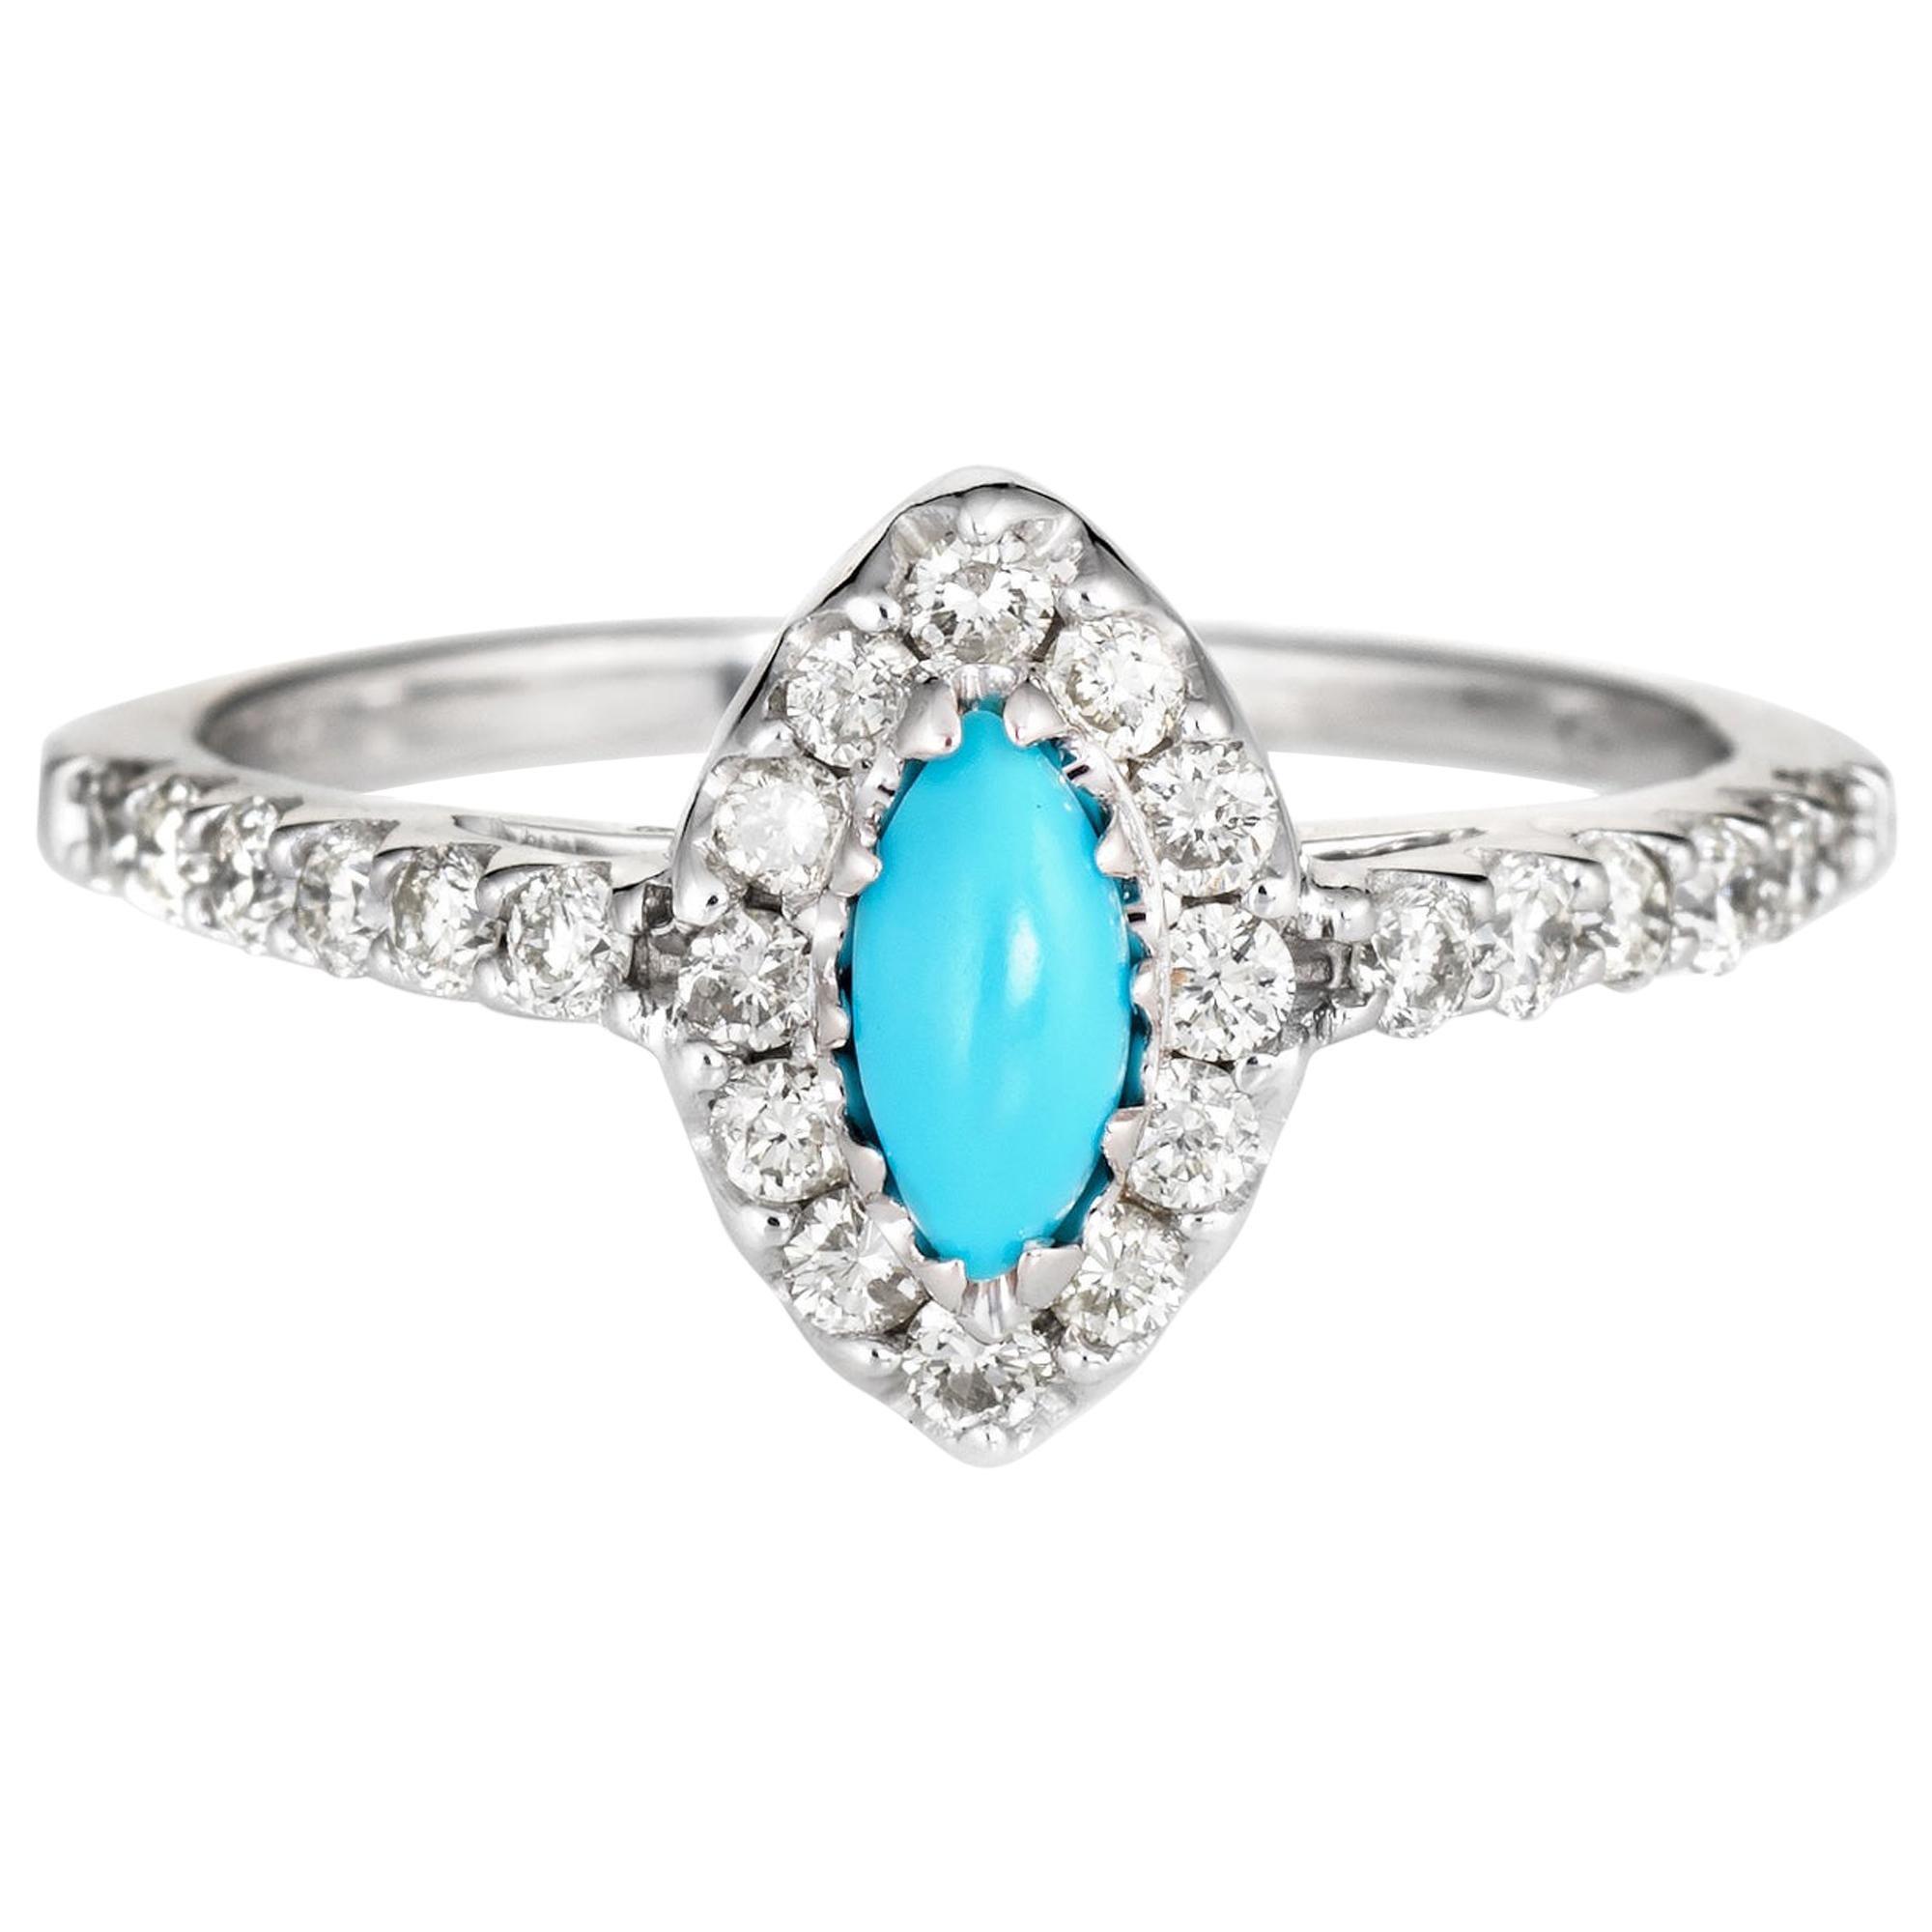 Turquoise Diamond Ring Vintage 14 Karat White Gold Marquise Cocktail Jewelry